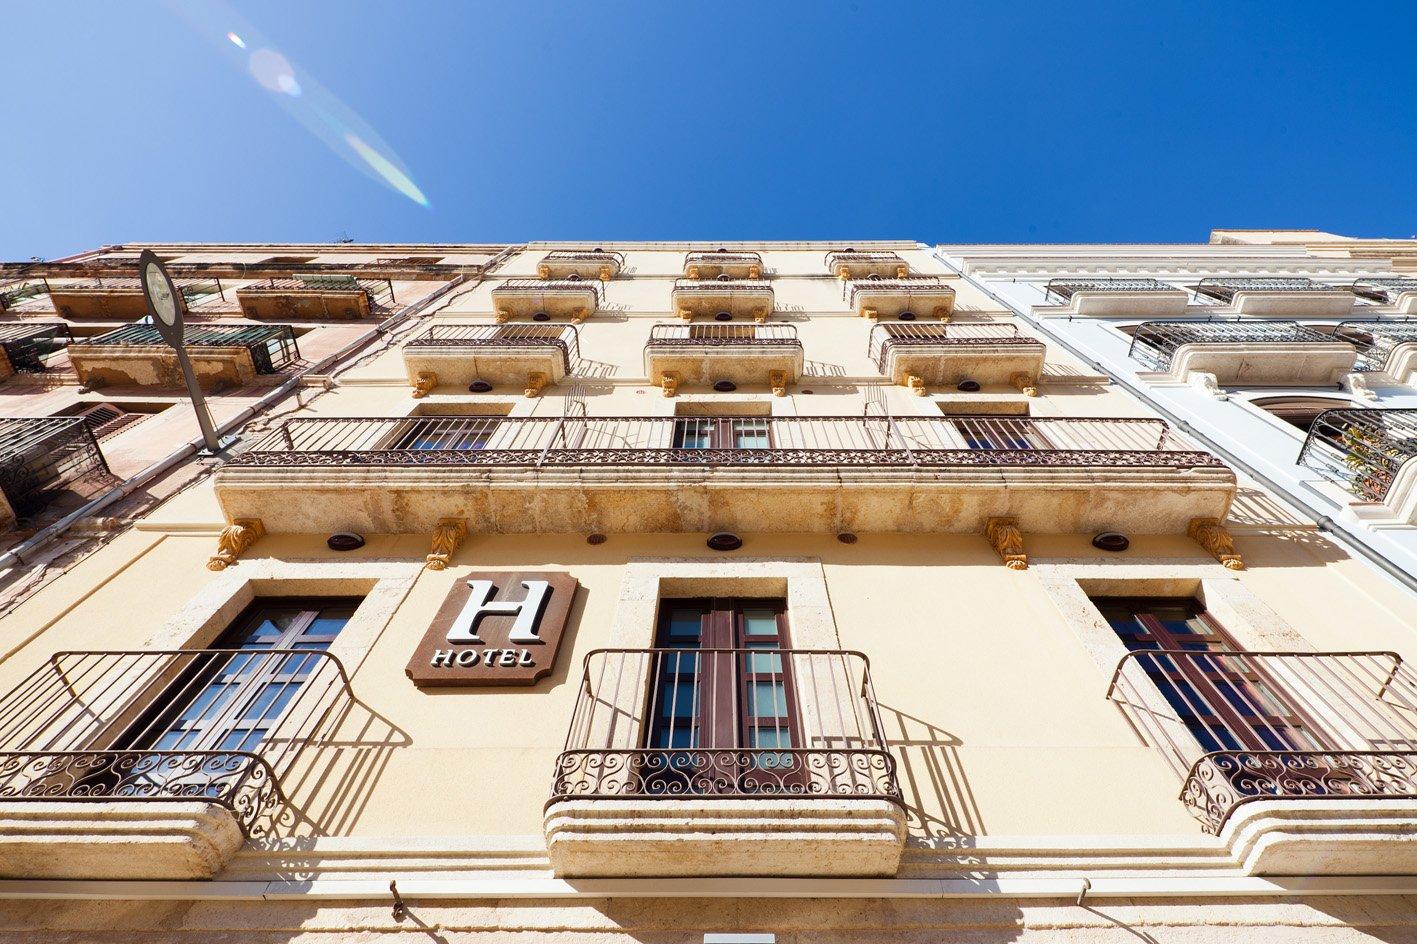 hotel_la_fontnombre_del_documento_18-ad42a53f80adfb0c12ecefdac805d701